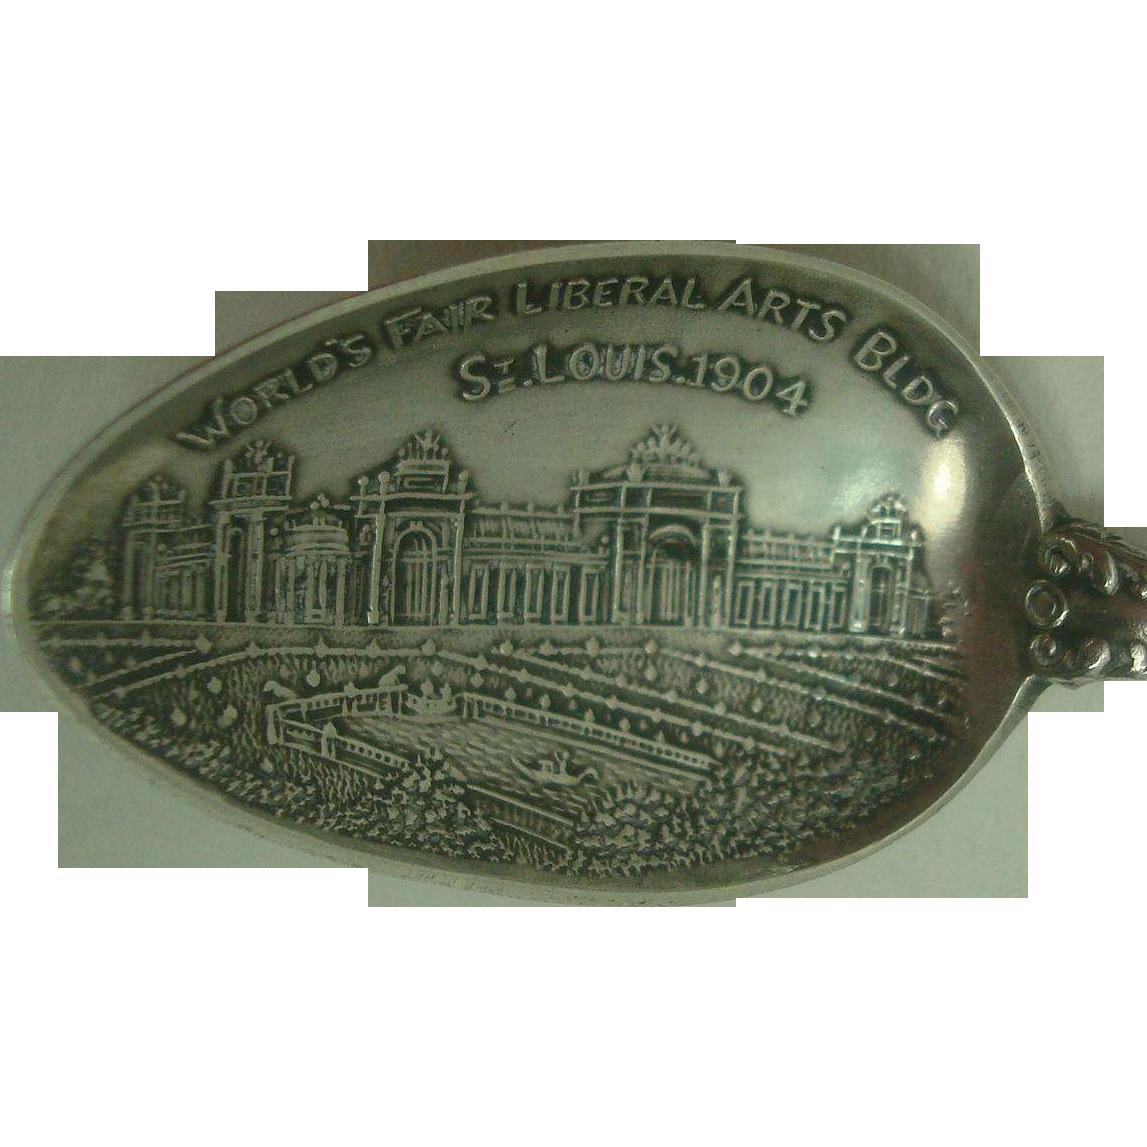 1904 St Louis Worlds Fair Liberal Arts Building Souvenir Spoon